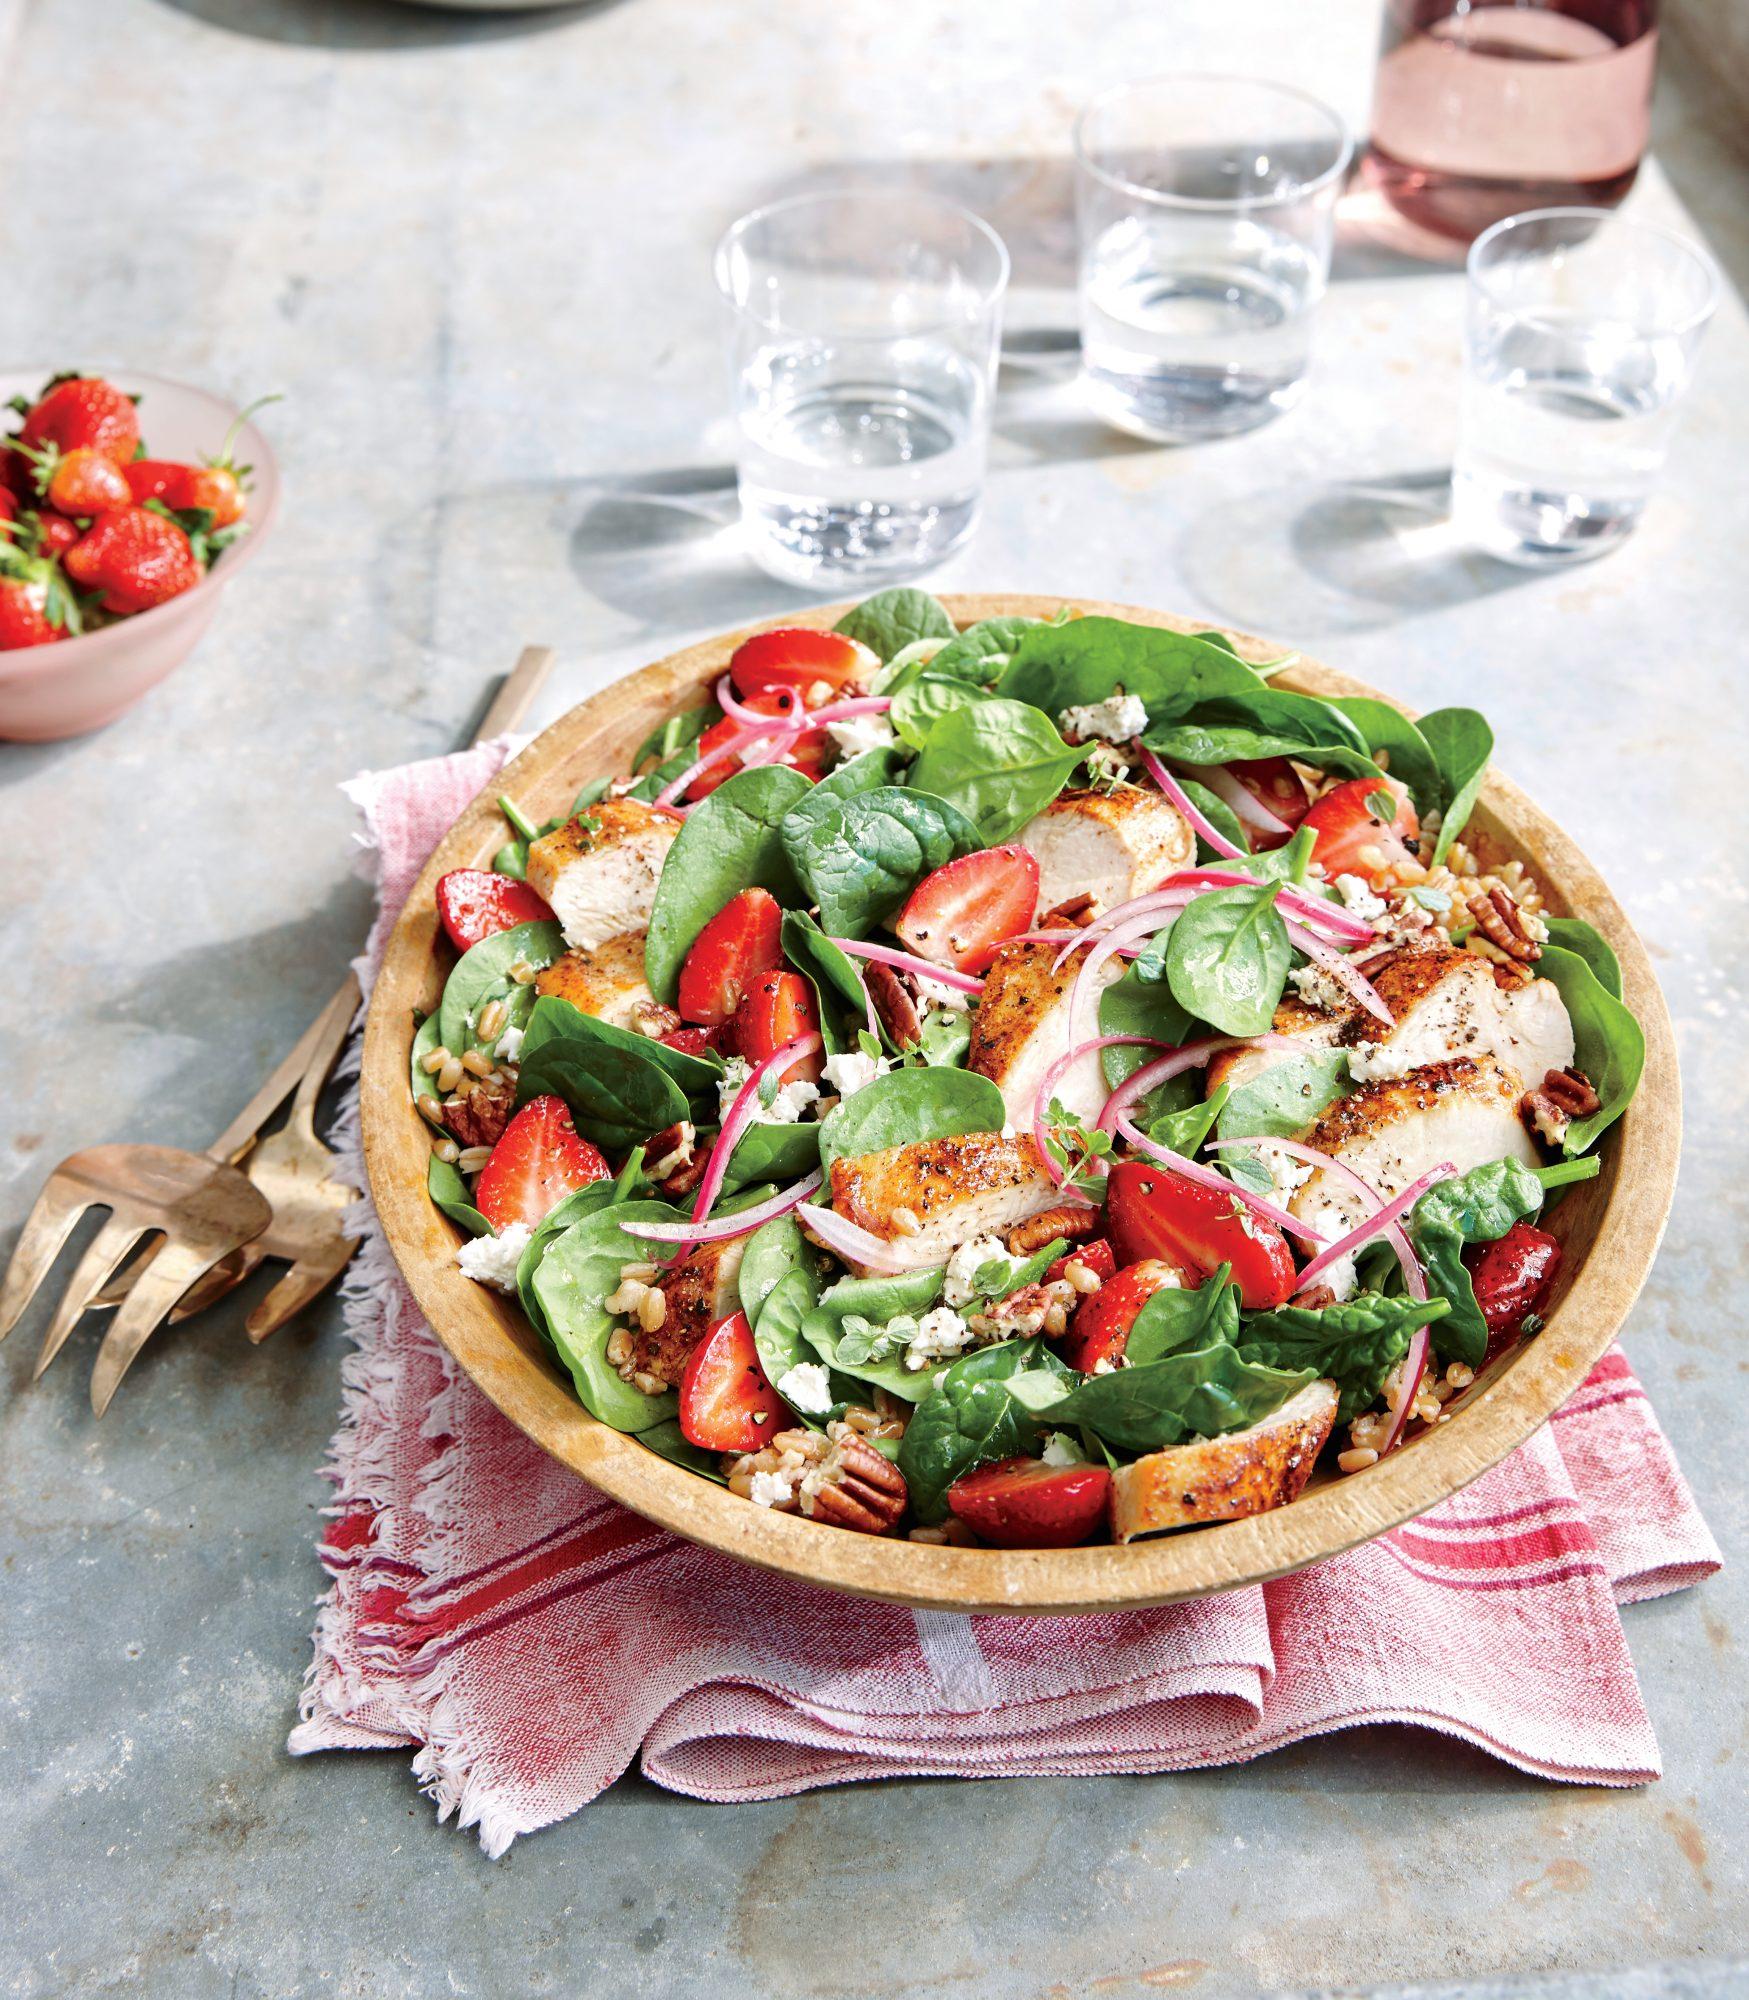 Strawberry-Chicken Salad With Pecans Recipe